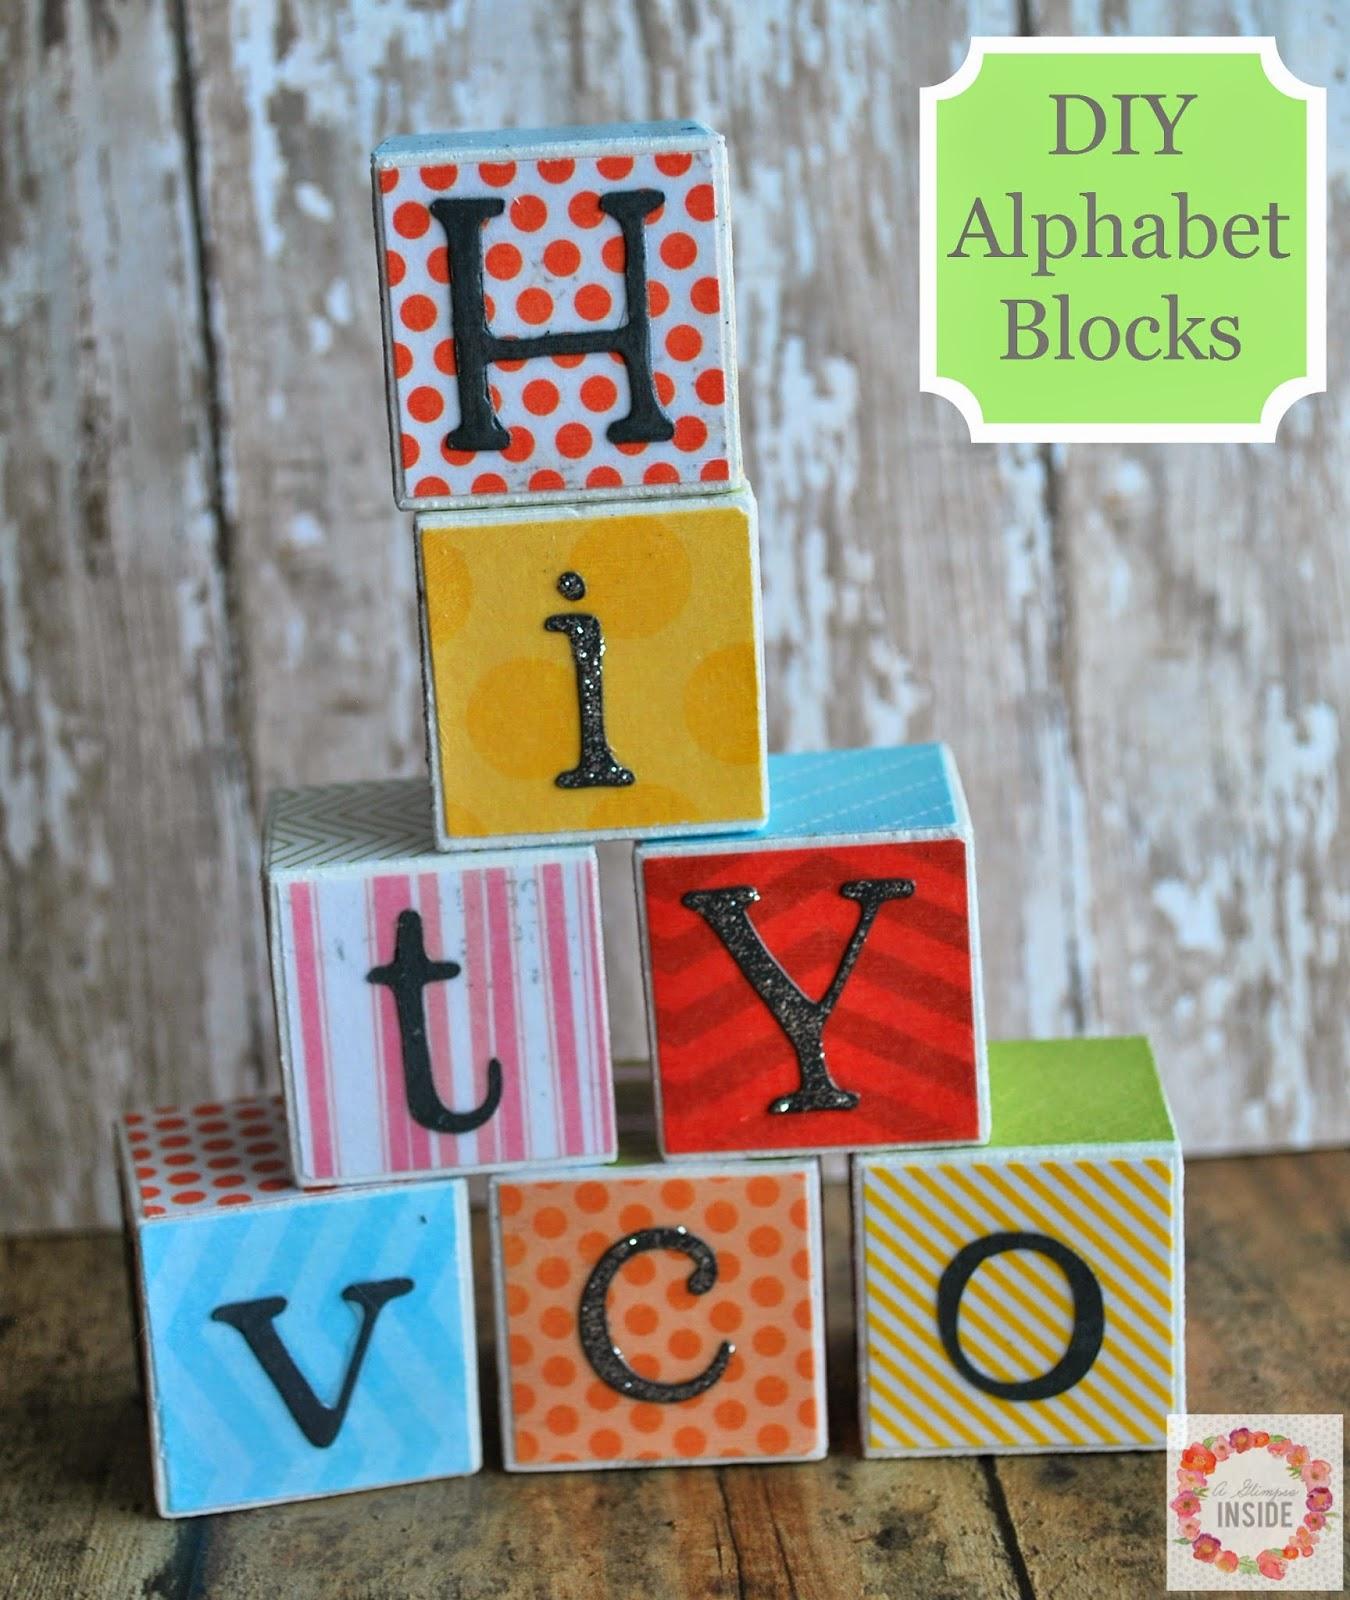 http://www.aglimpseinsideblog.com/2014/08/diy-alphabet-blocks.html